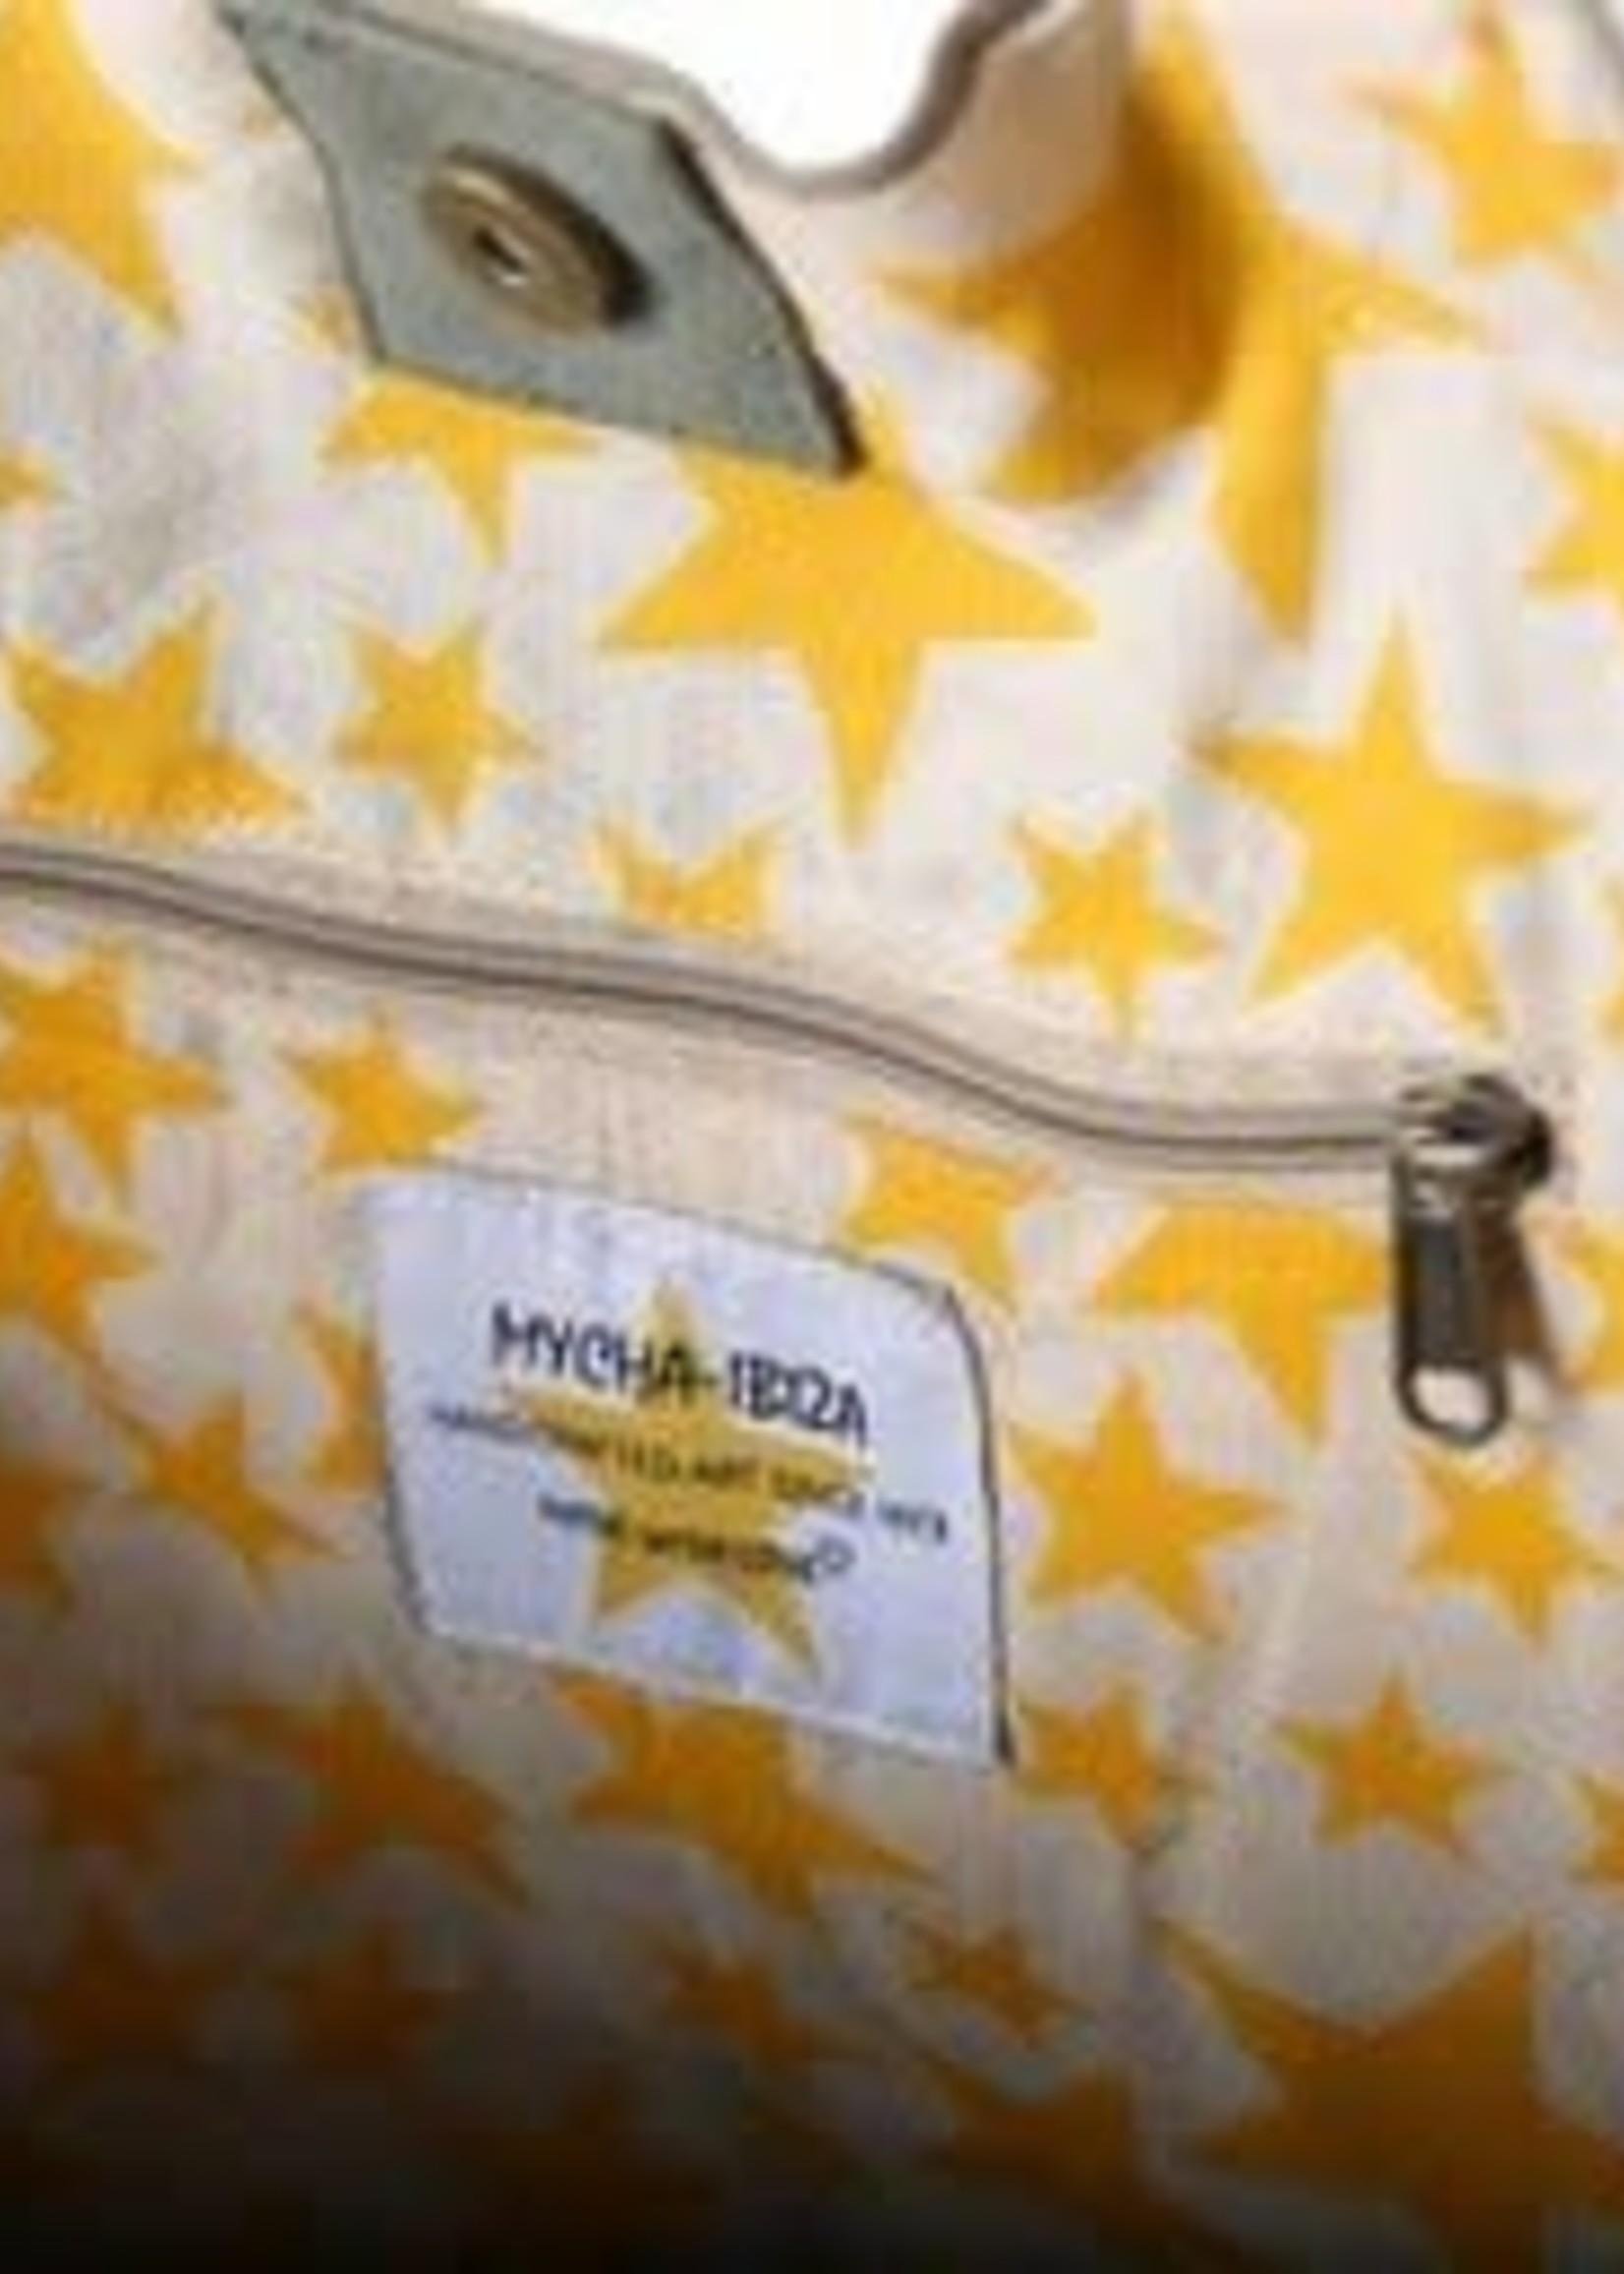 Mycha Ibiza Mycha - Ibiza - Talamanca Coordinates 1035